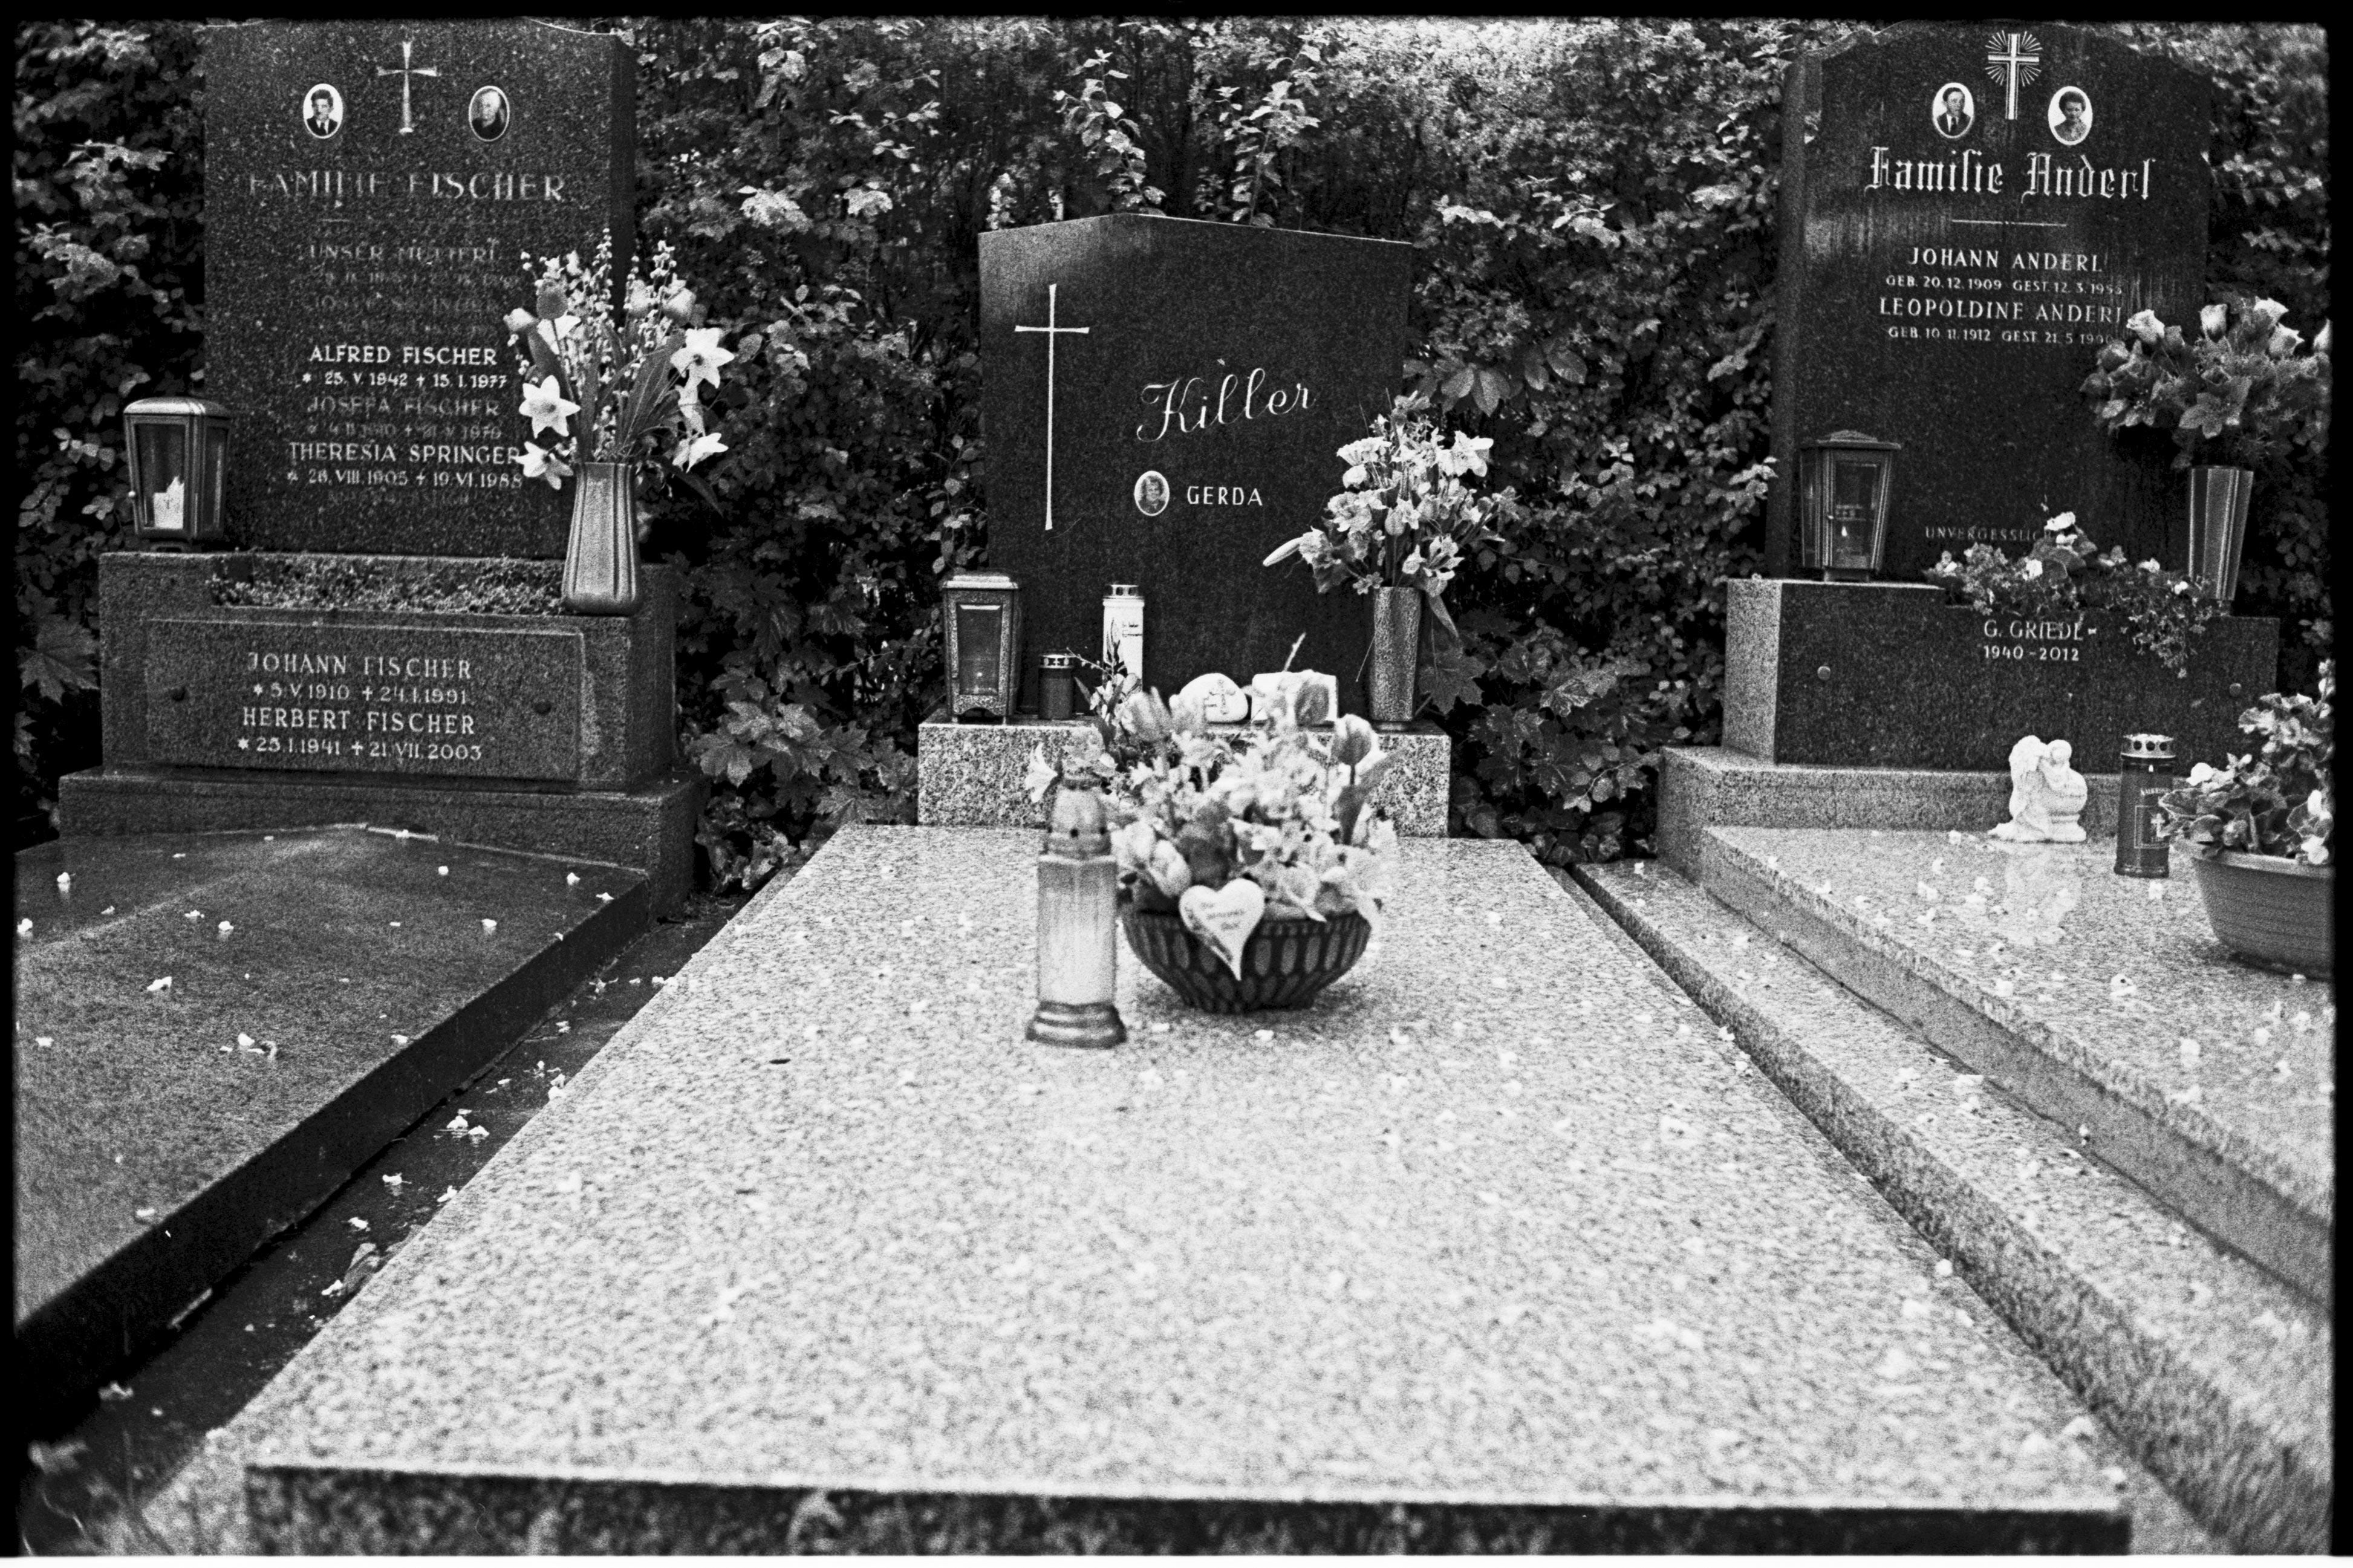 Friedhof, Tod, schwarzweiß, RIP